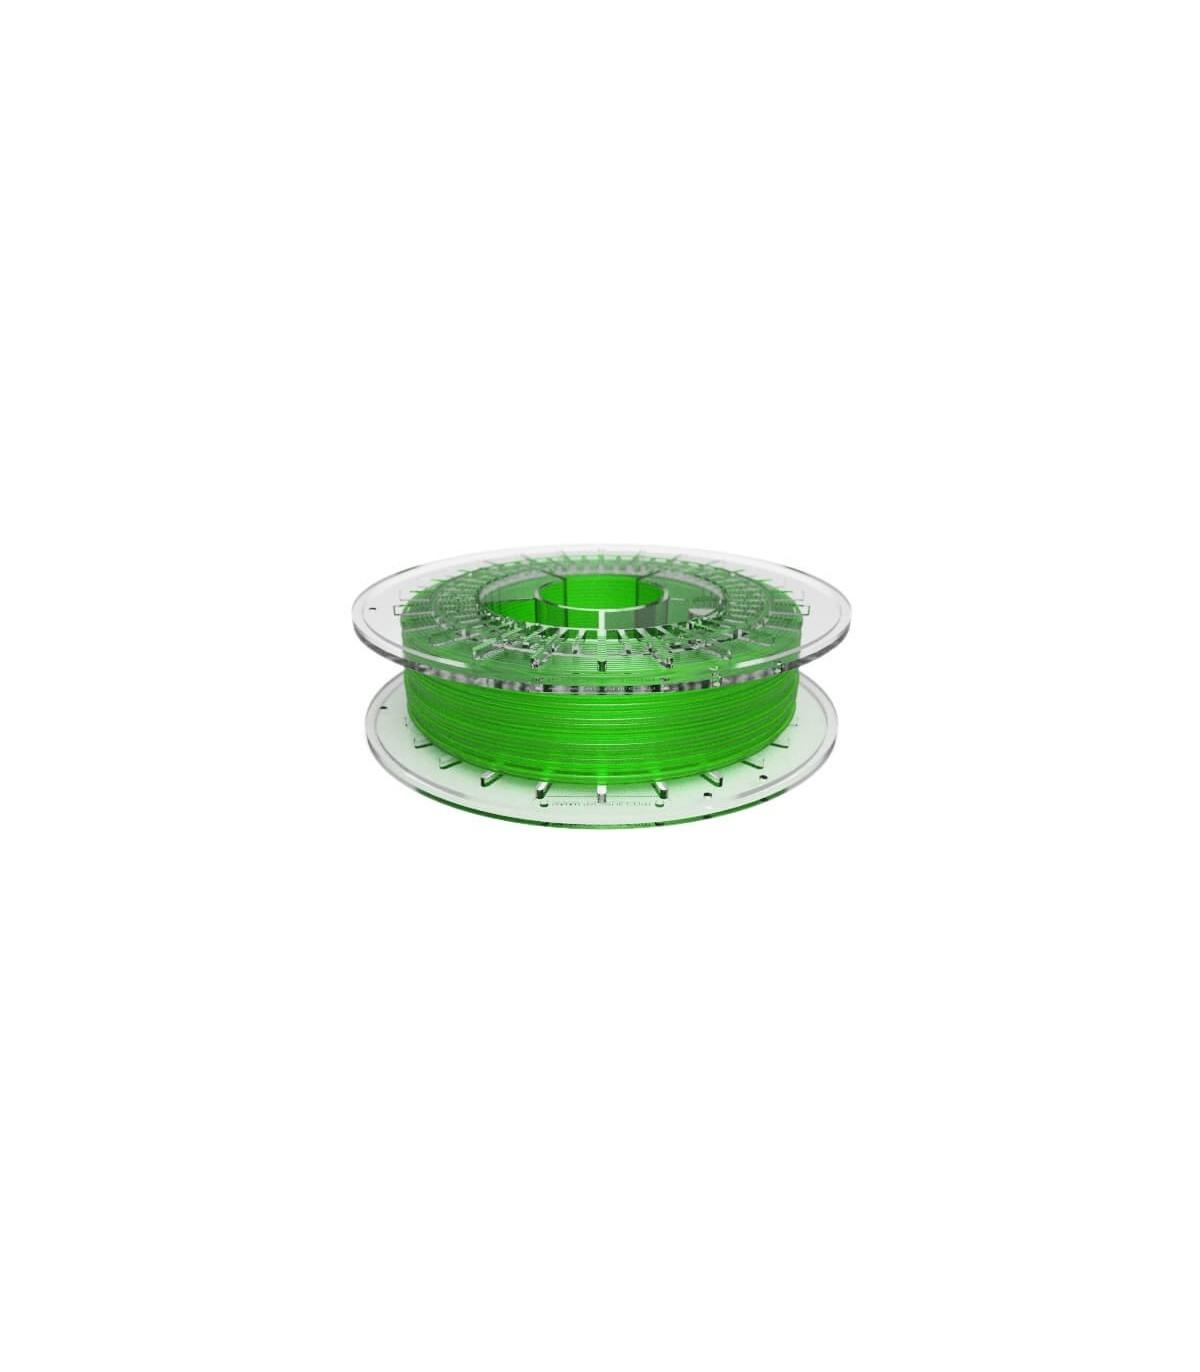 FilaFlex Clear Green 82A TPE Filament 2.85 mm 500g